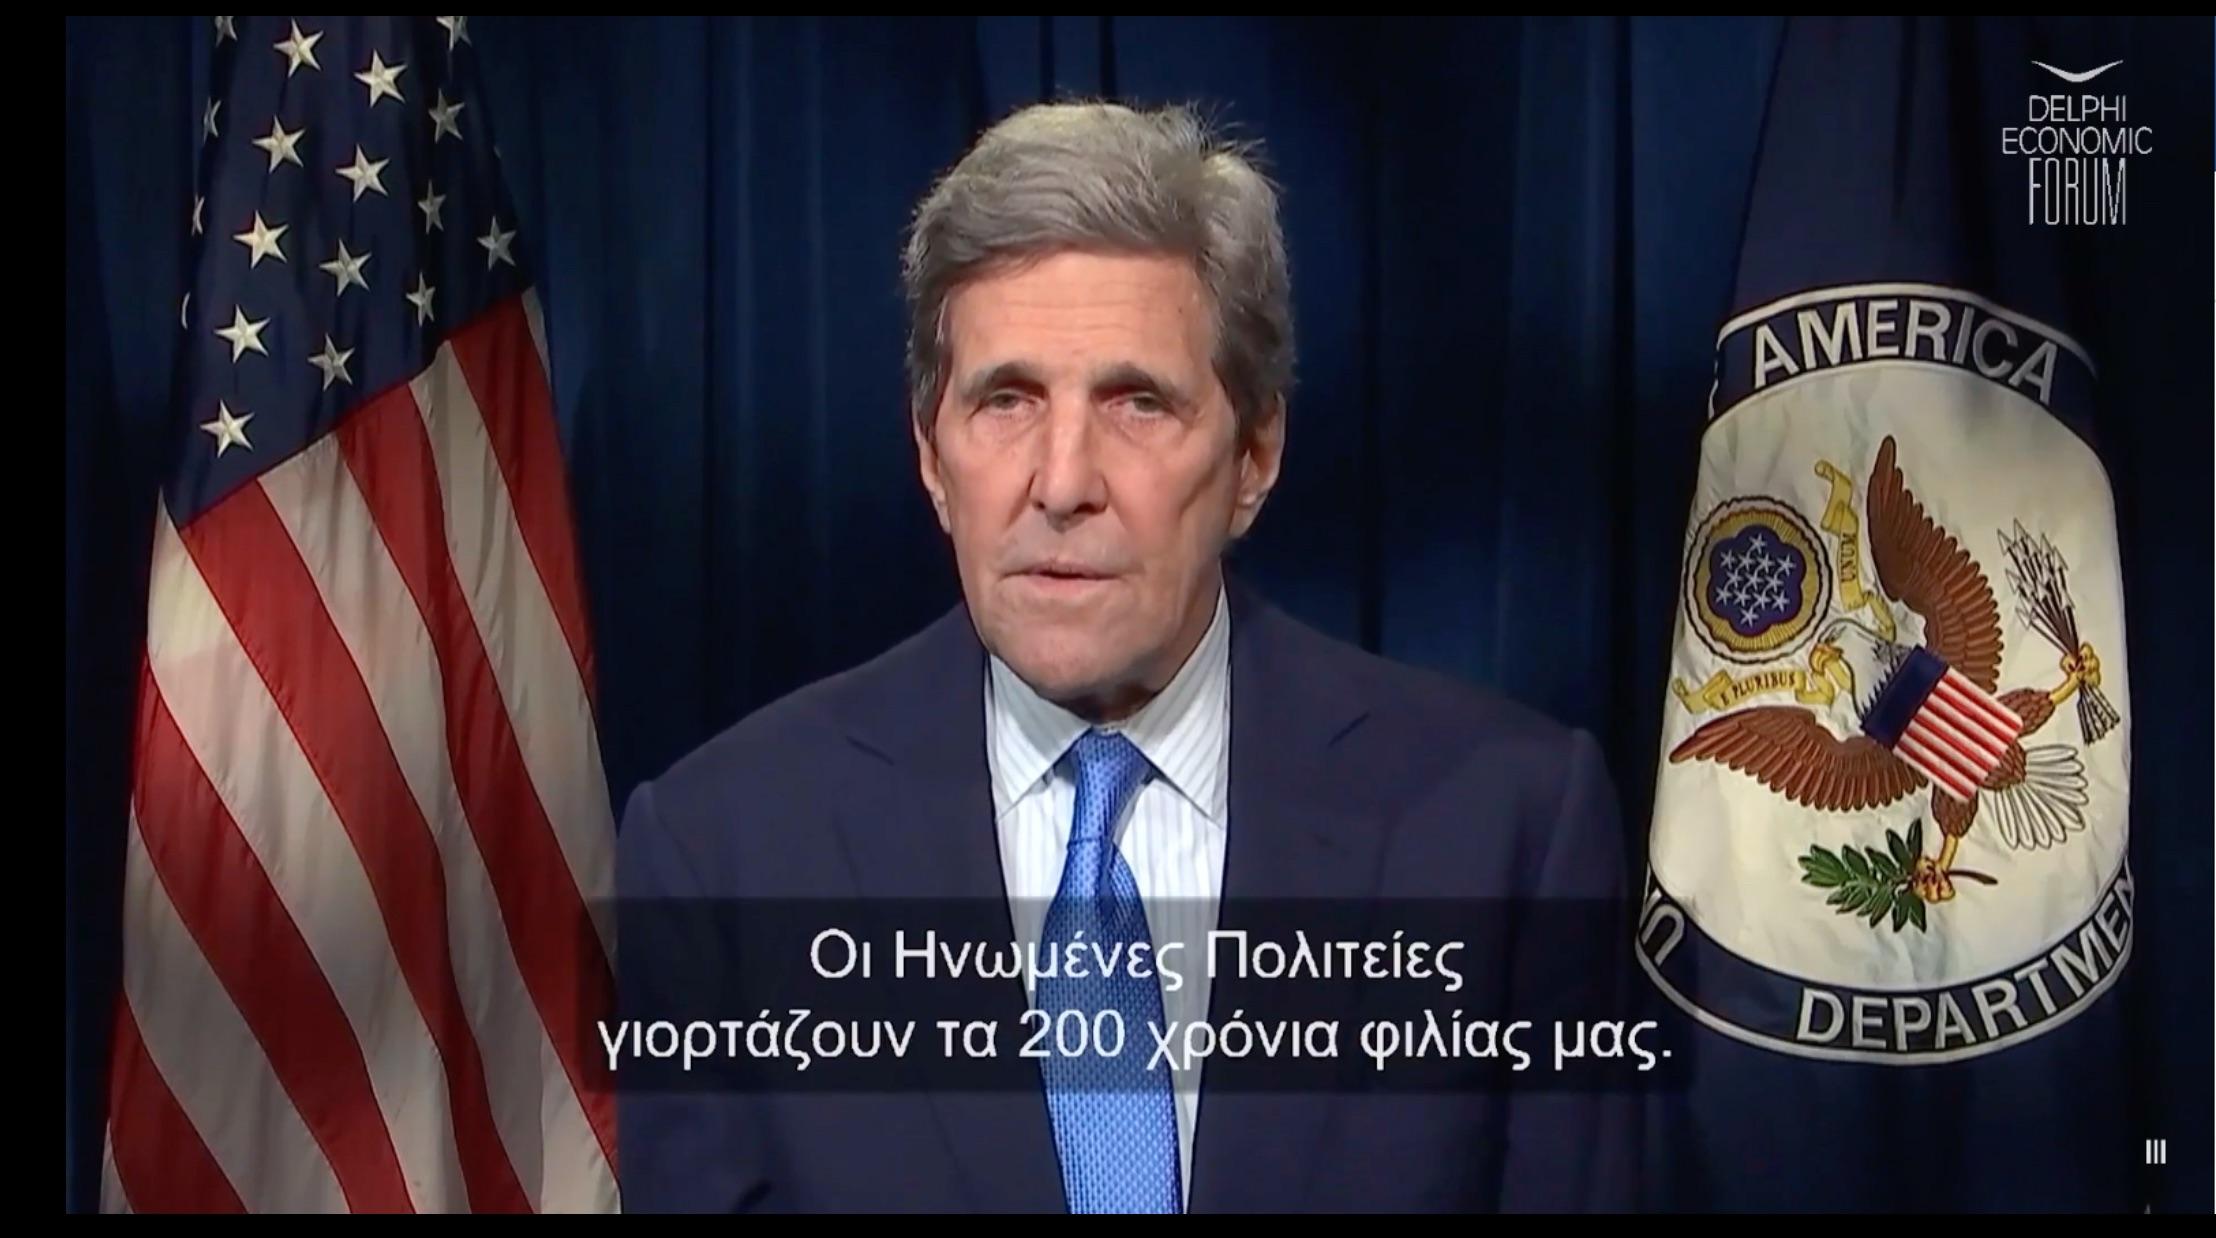 Special Presidential Envoy for Climate John Kerry Remarks at Delphi Economic Forum   US Embassy & Consulate in Greece - US Embassy in Greece - USEmbassy.gov